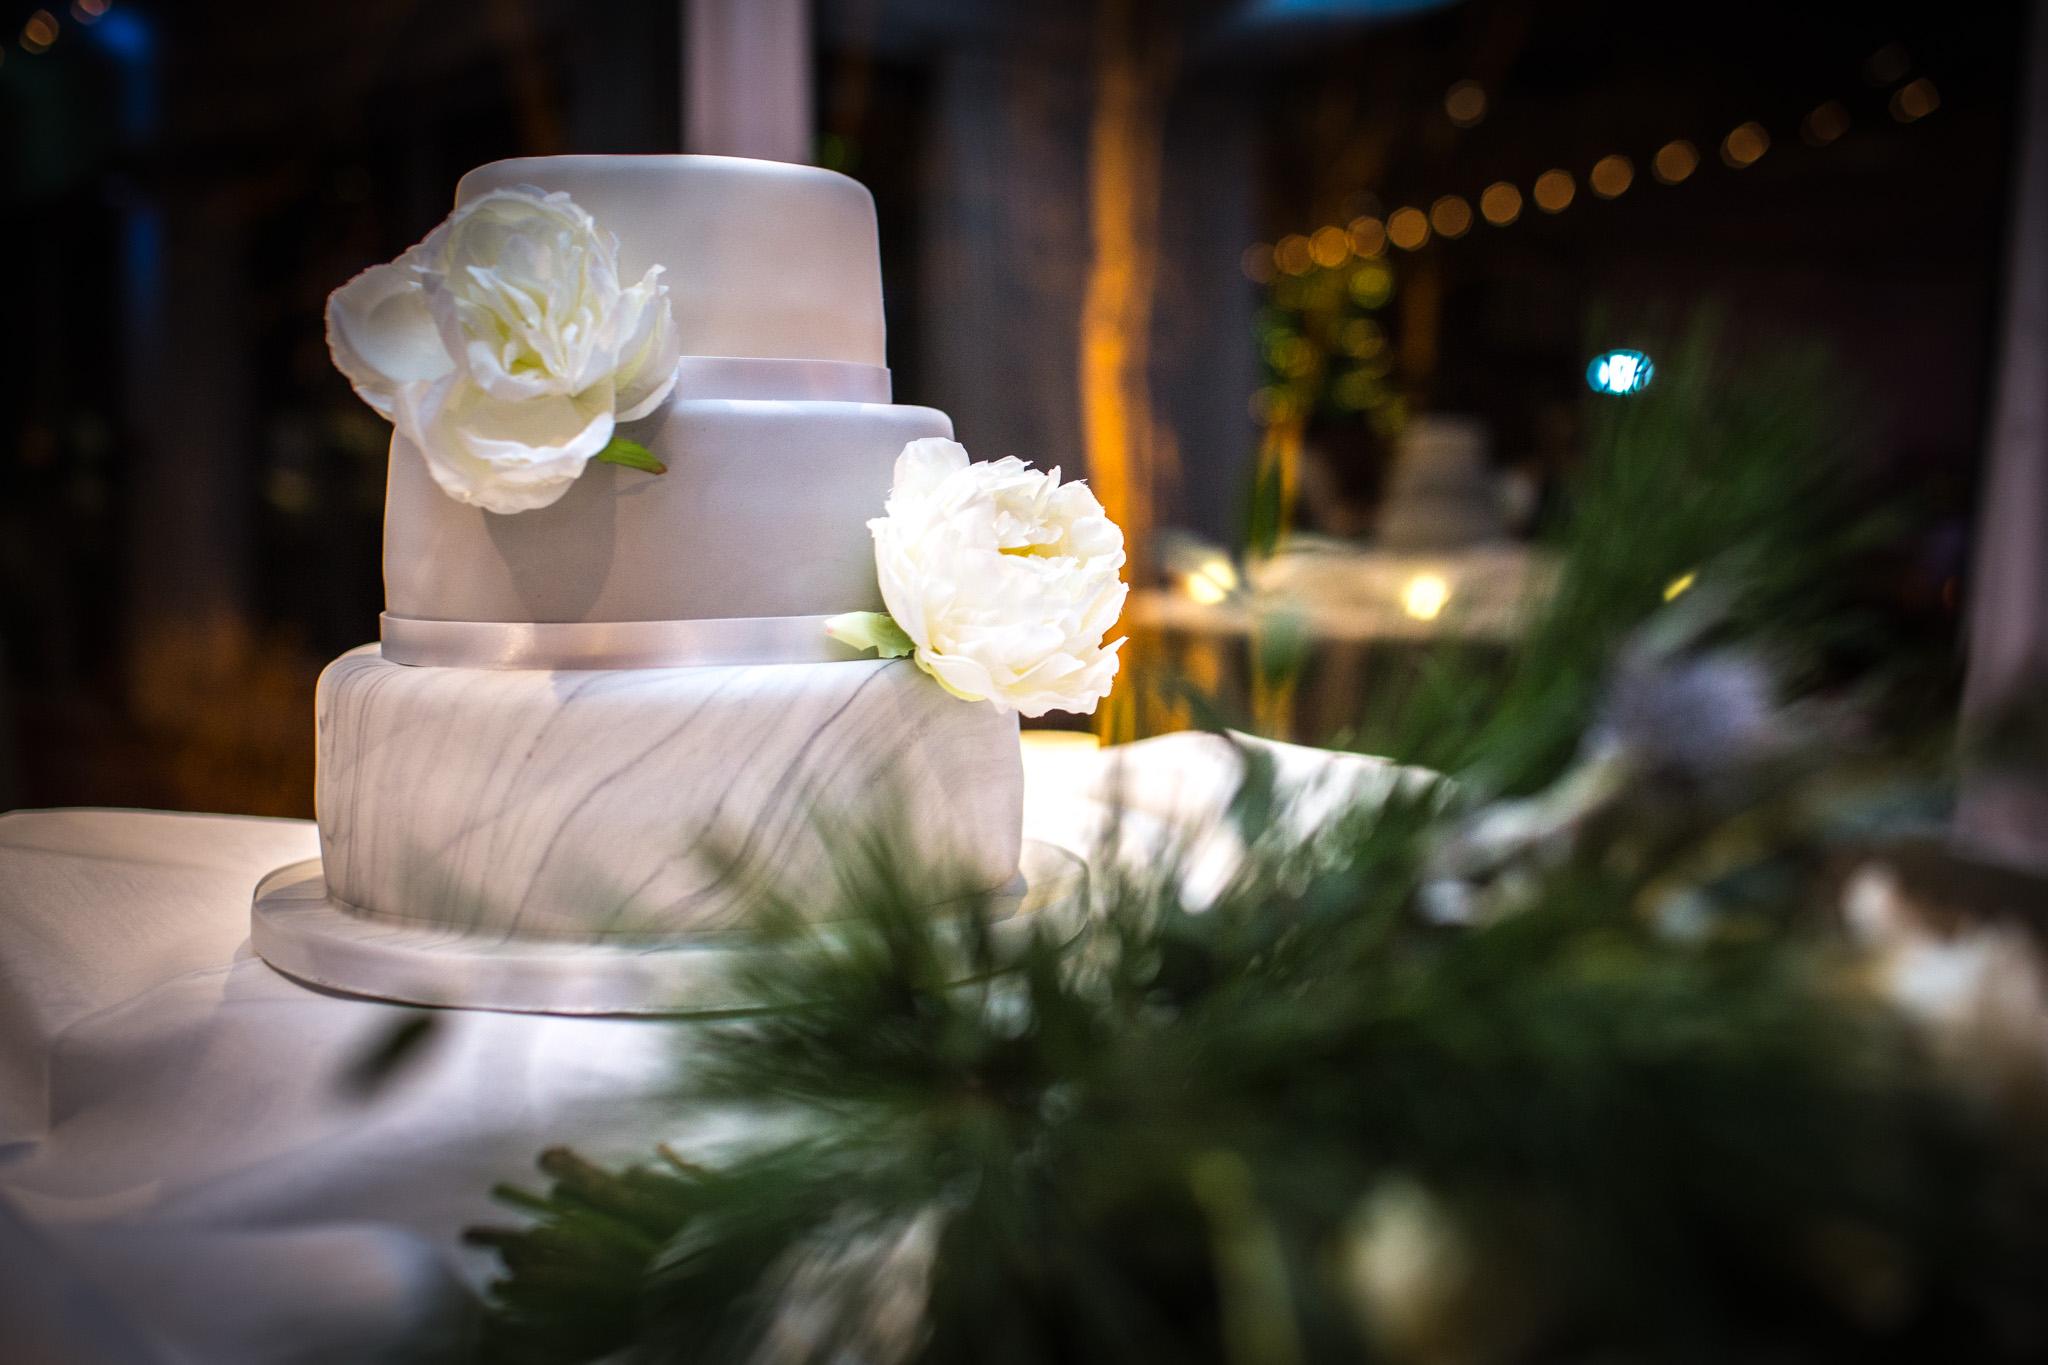 Mark_Barnes_Northern_Ireland_wedding_photographer_Harveys_Point_Donegall_Wedding_photography-Adam&Gemma-56.jpg